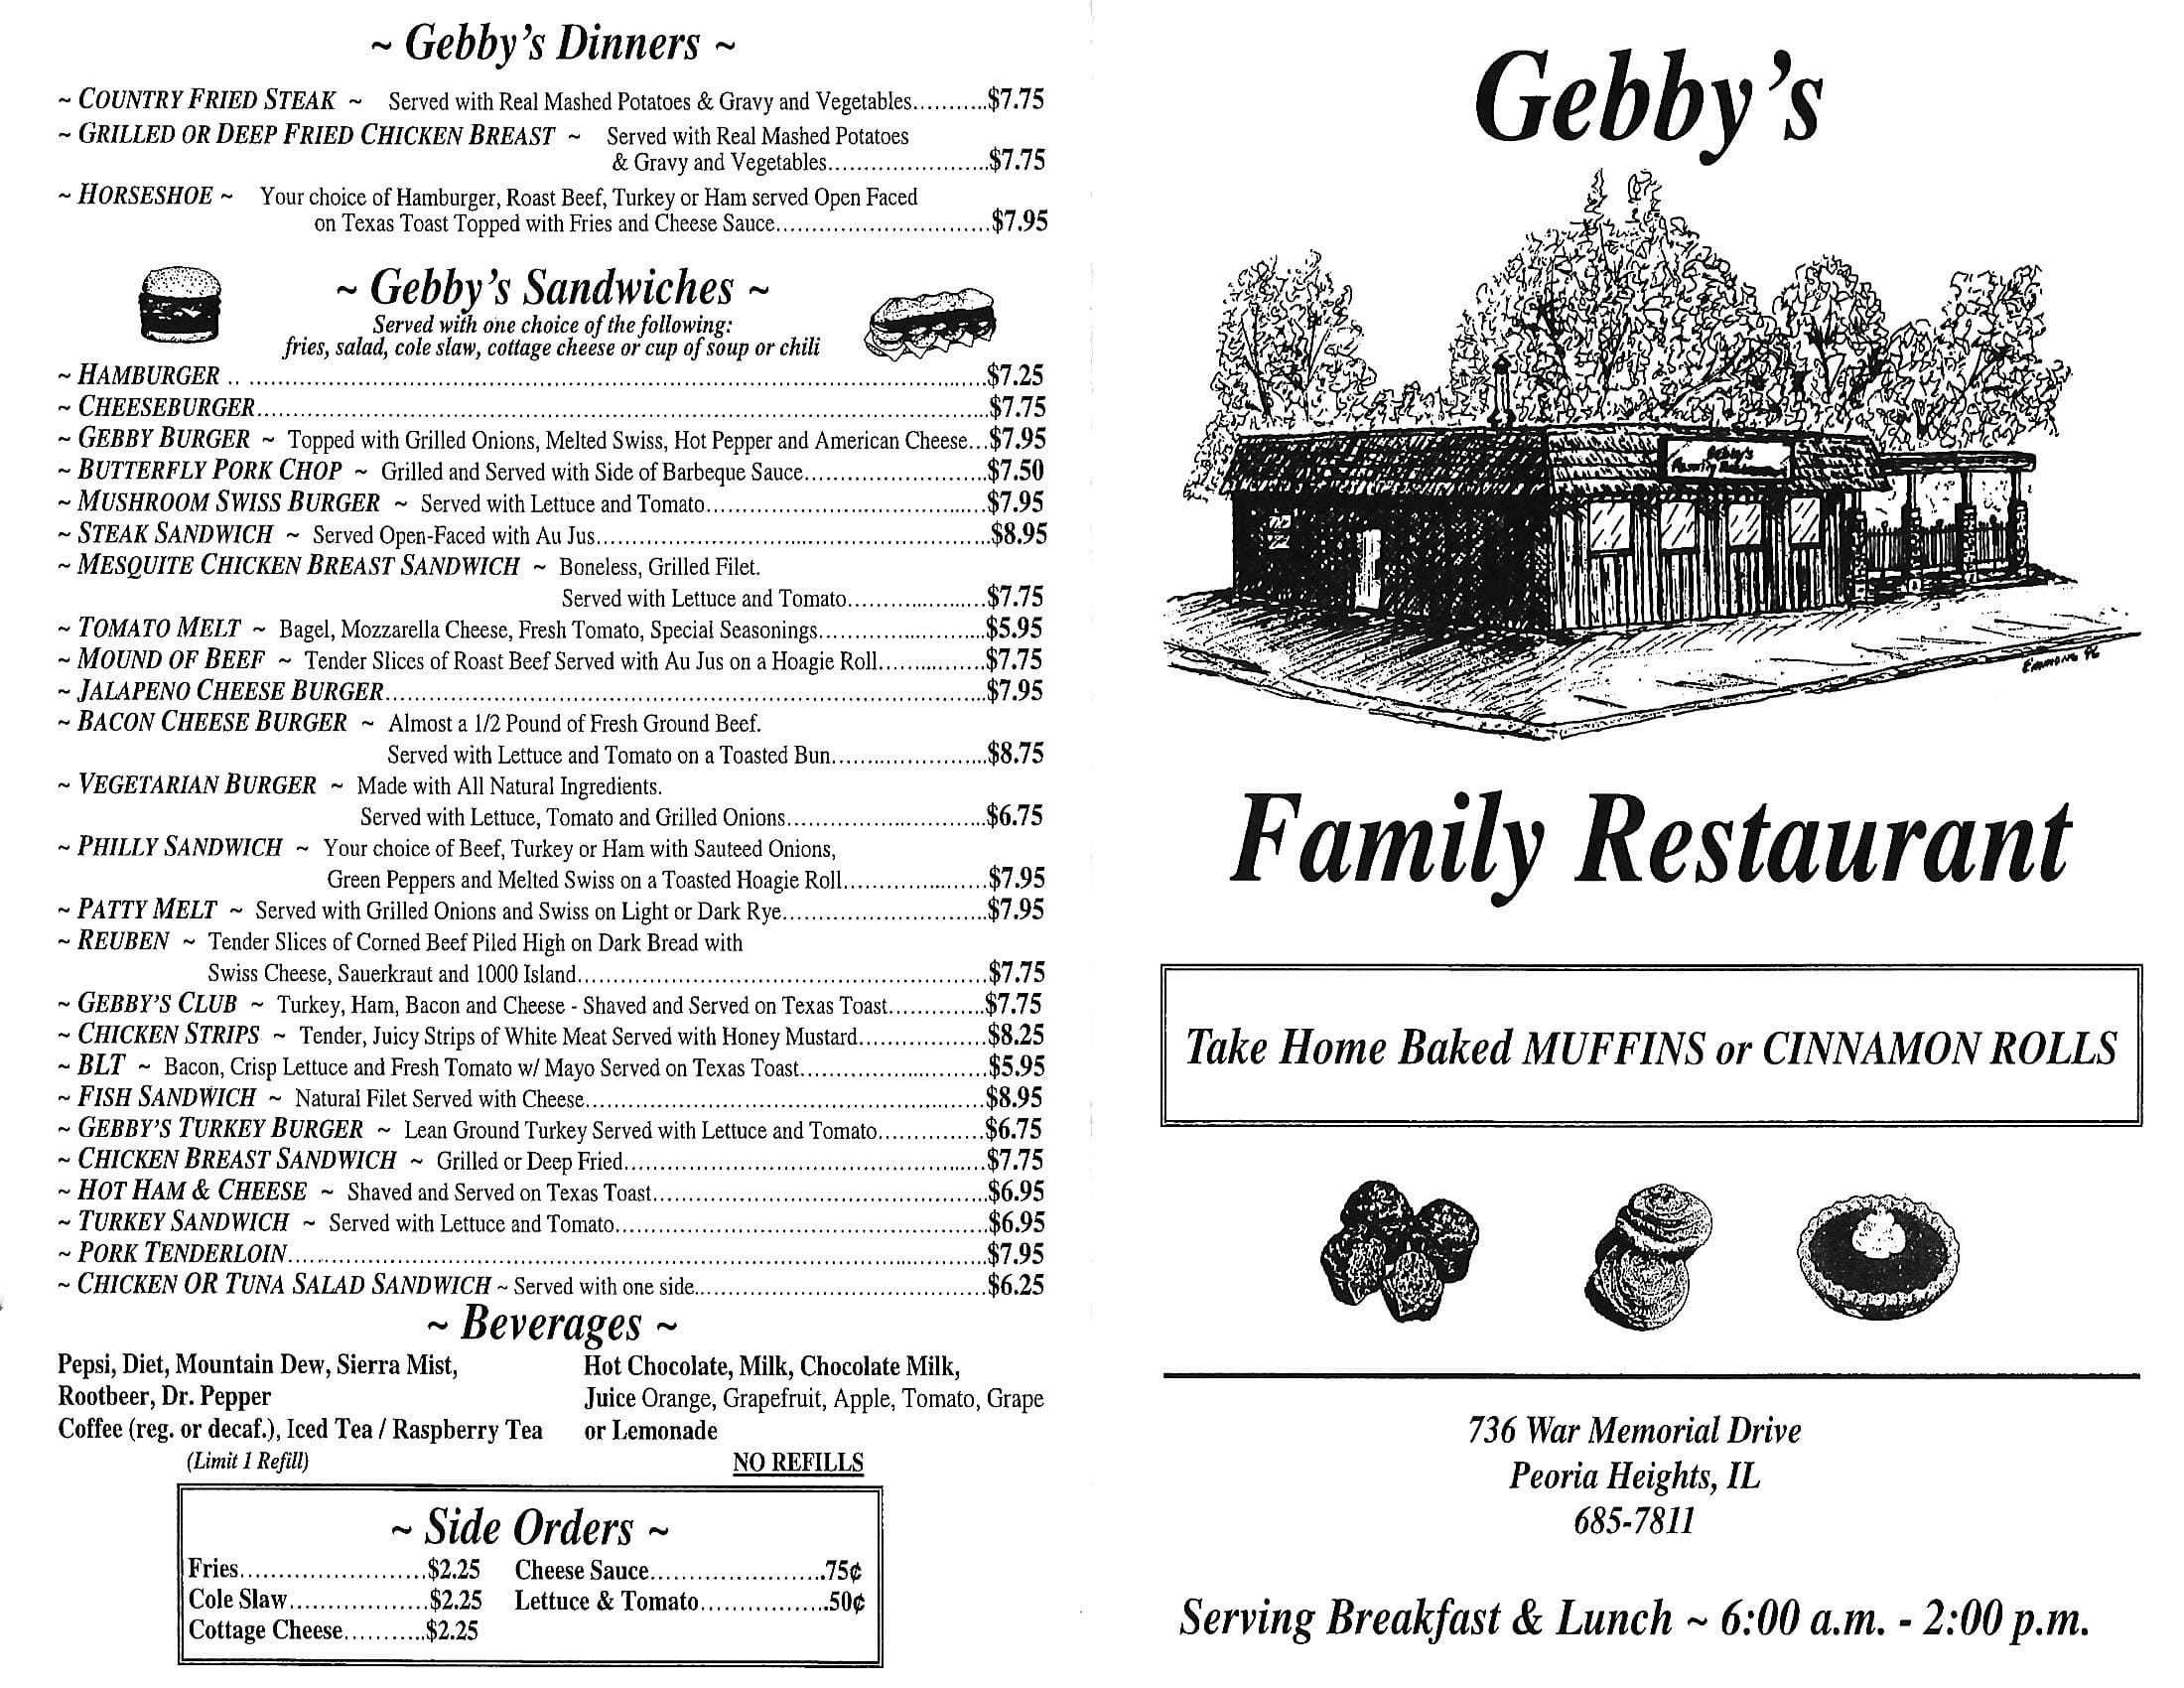 Gebbys Family Restaurant Menu Urbanspoonzomato